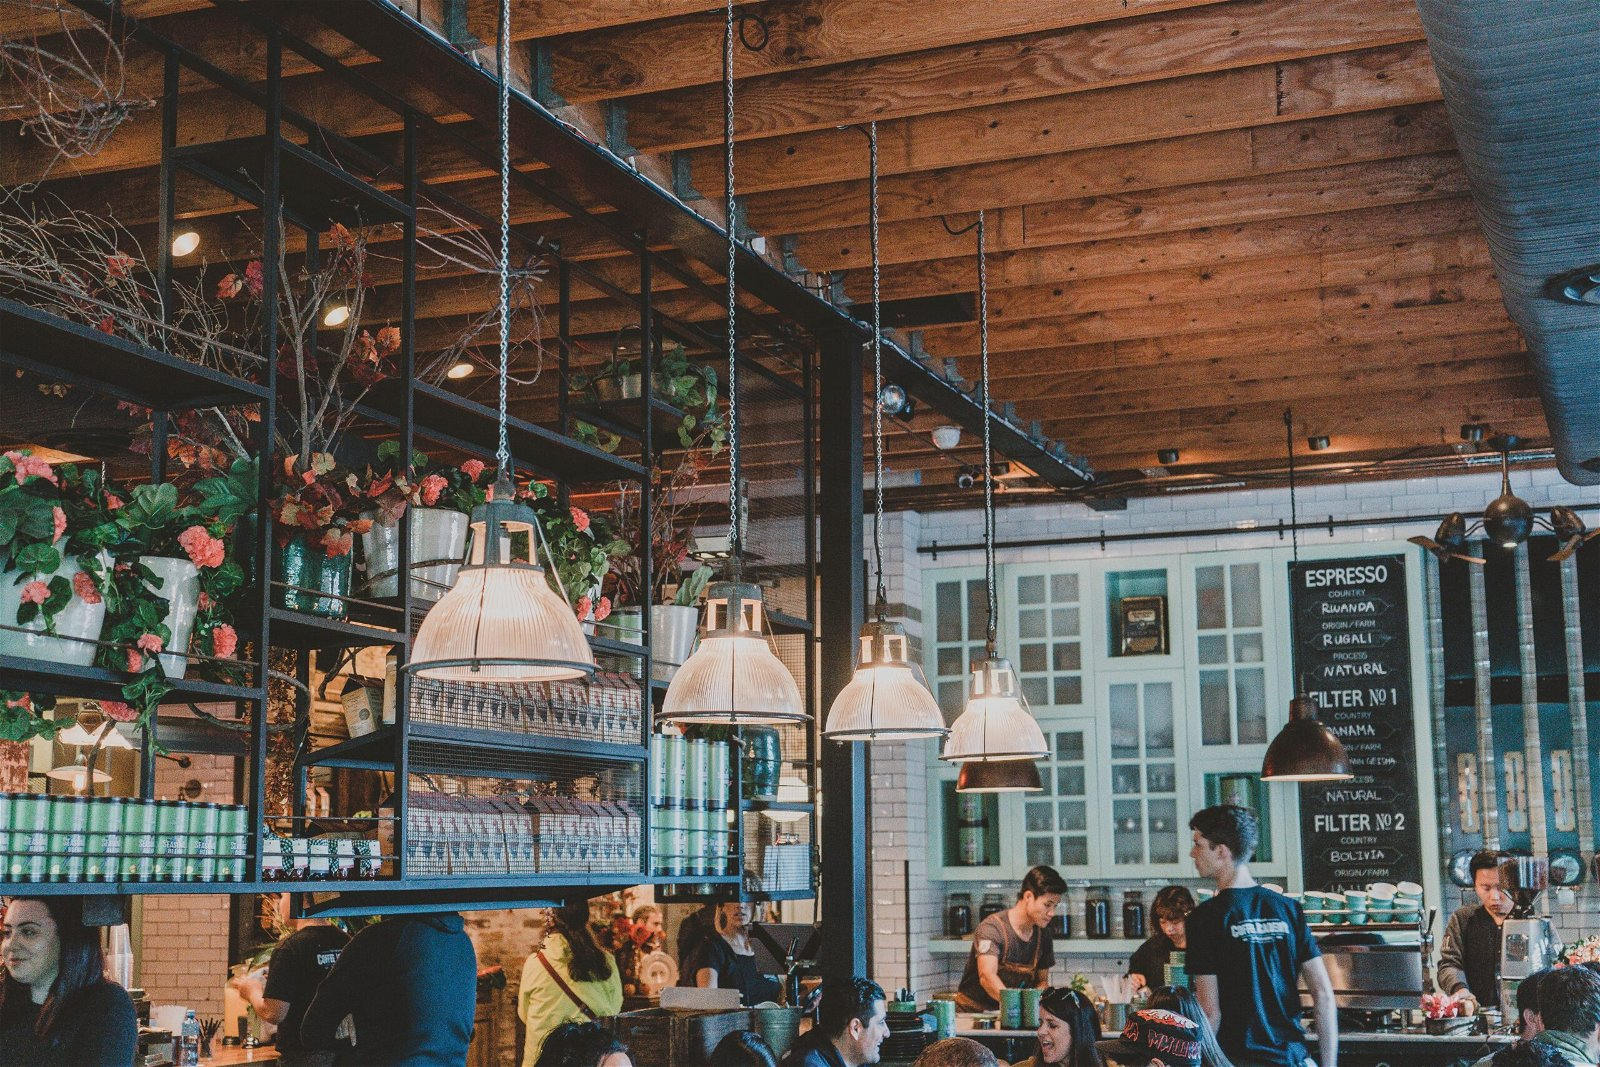 Cafe Design | Coffee Shop Design | Cafe Lighting | ImpeccaBuild (6)